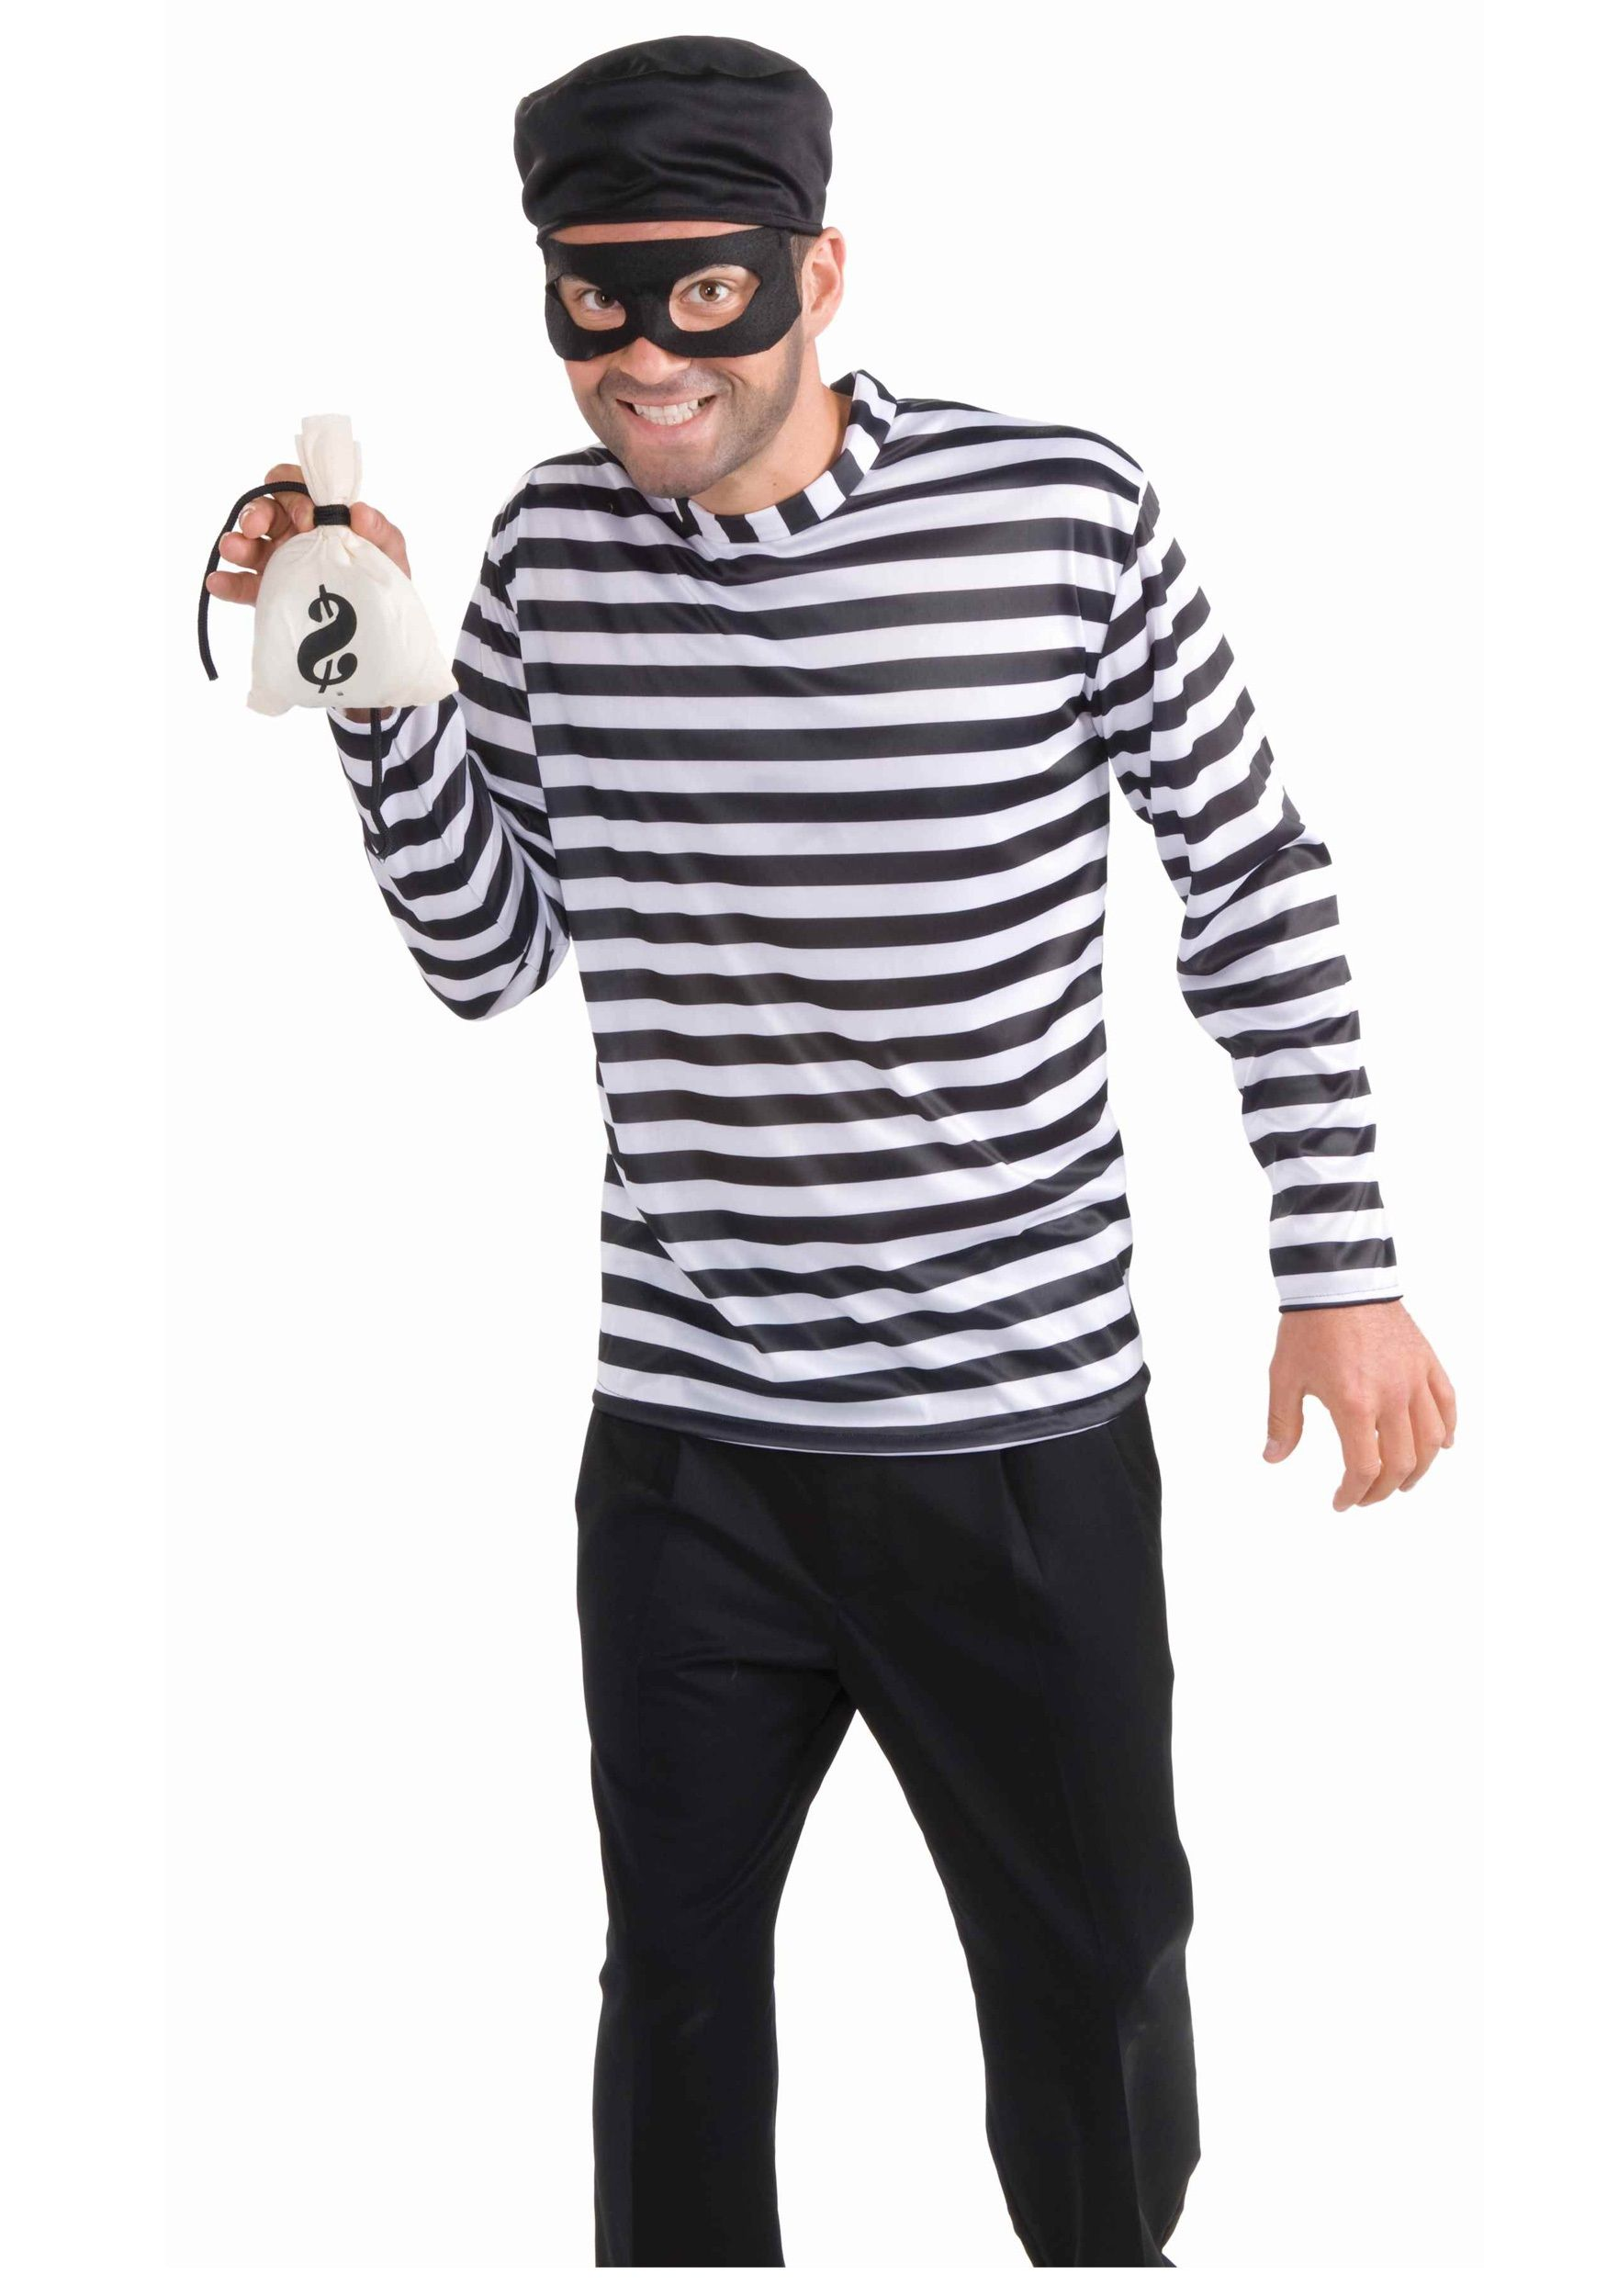 Adult Burglar Bank Robber Halloween Costume Kit Striped Shirt Eyemask Loot Bag